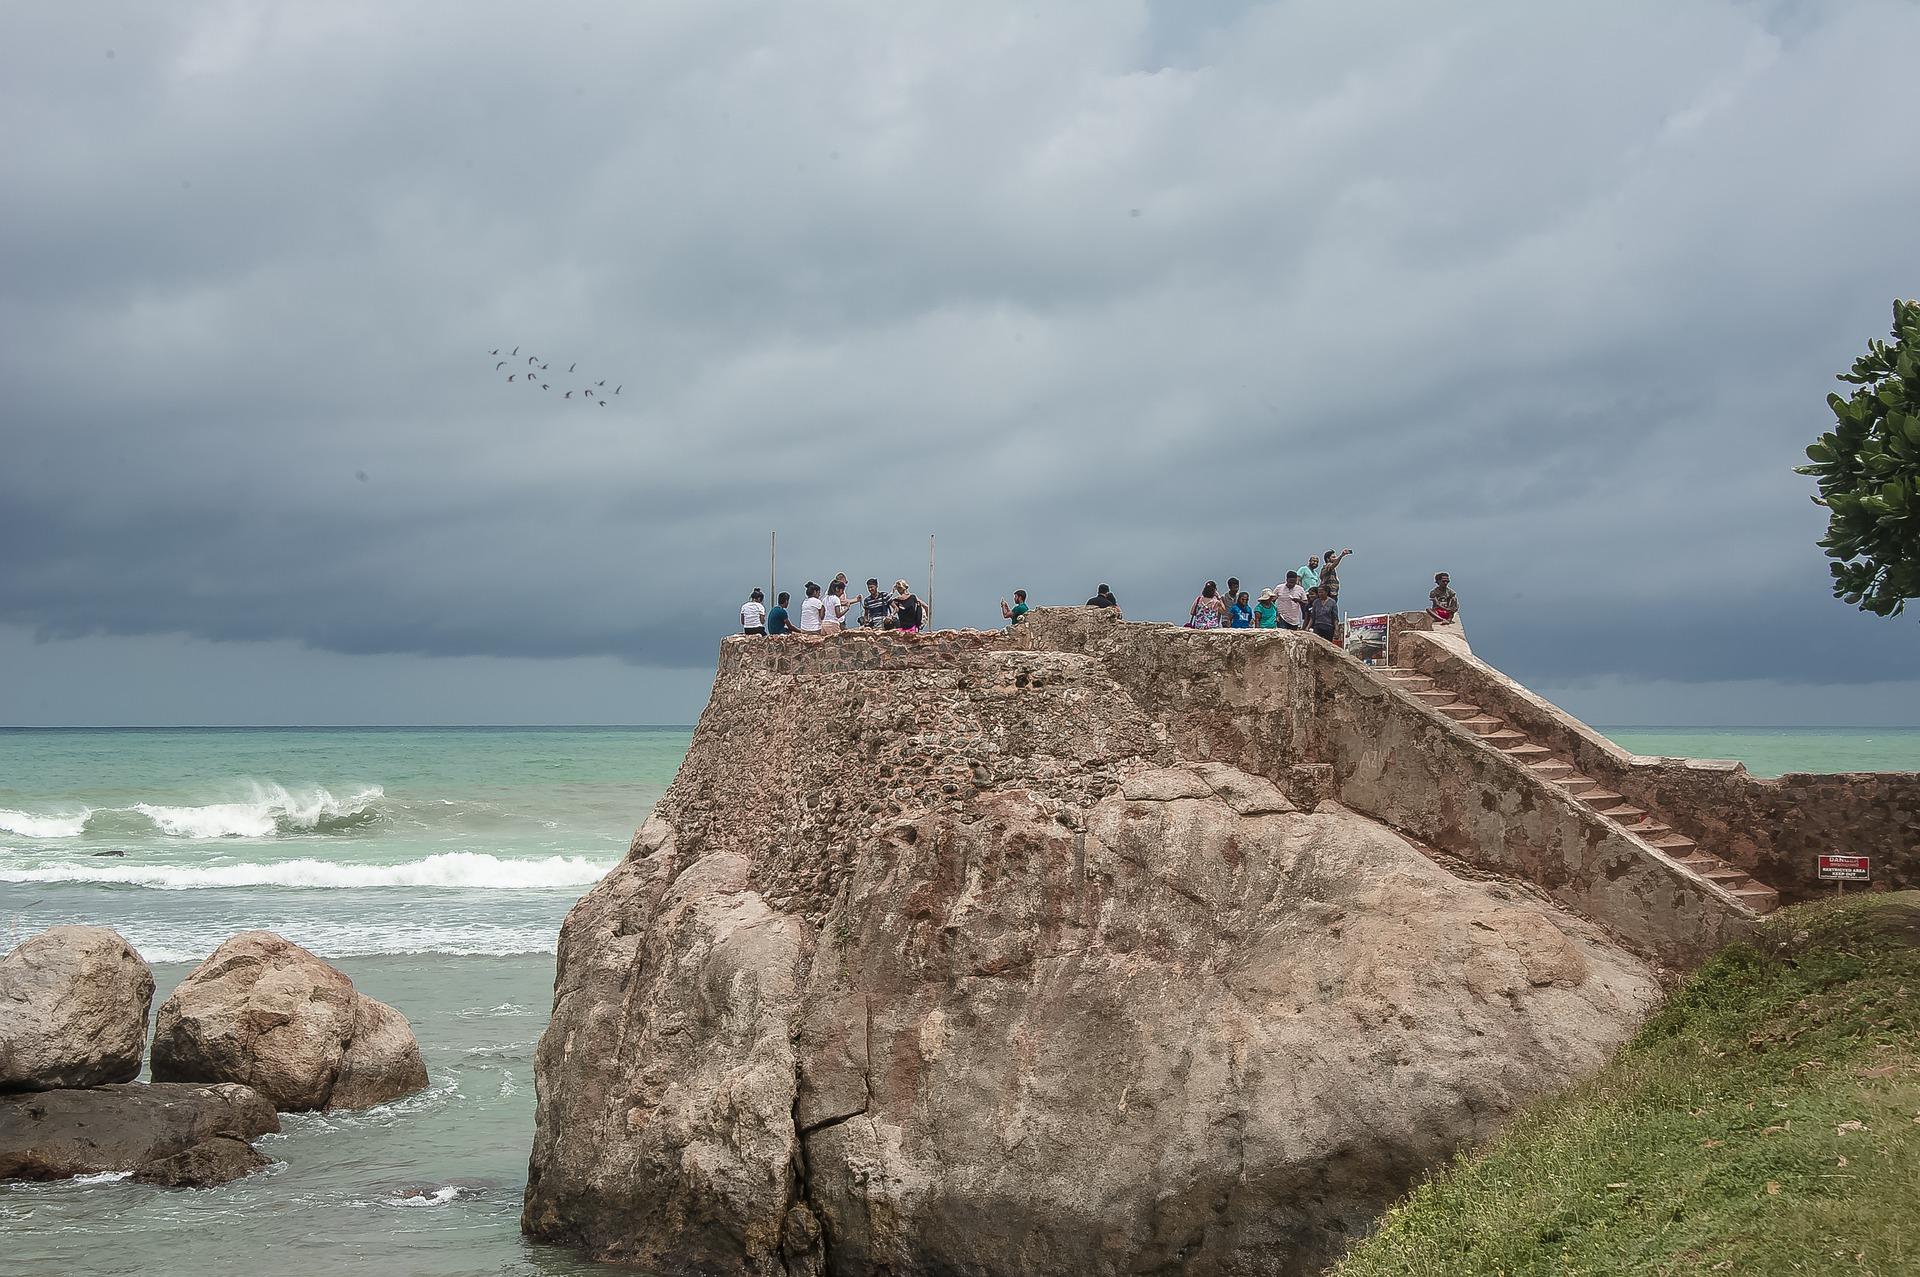 Rumassala in Galle-Must-visit Place During Ramayana Tour in Sri Lanka